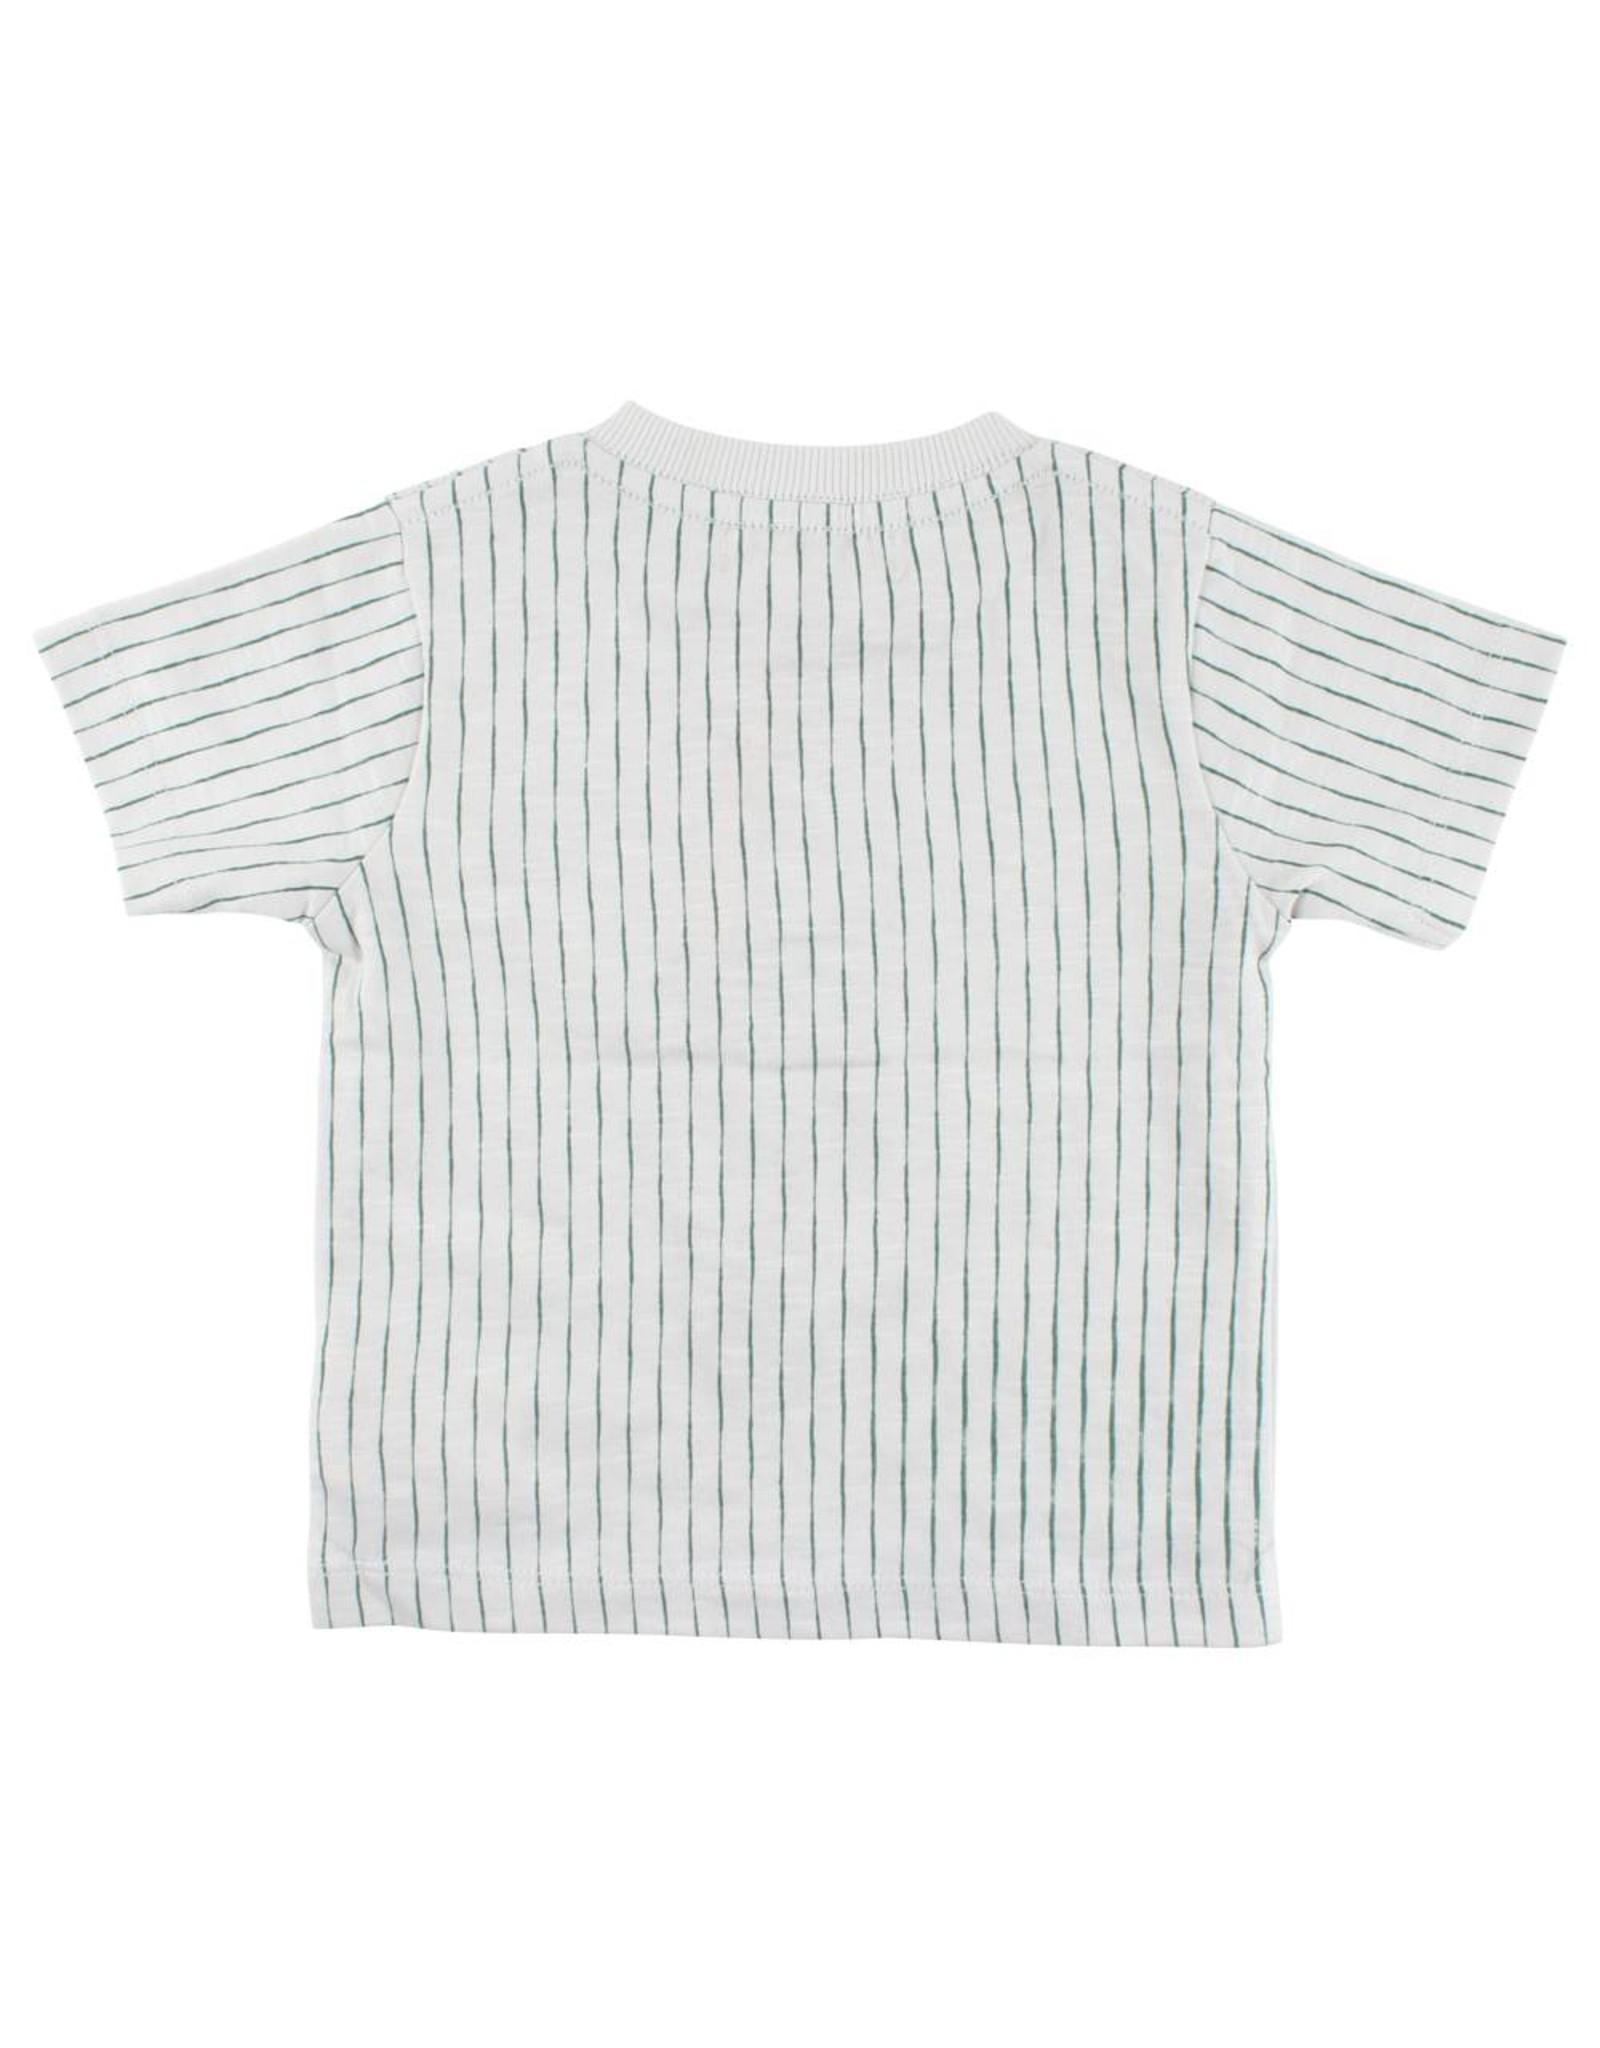 Small Rags Small Rags T-shirt Stripe Foggy Dew